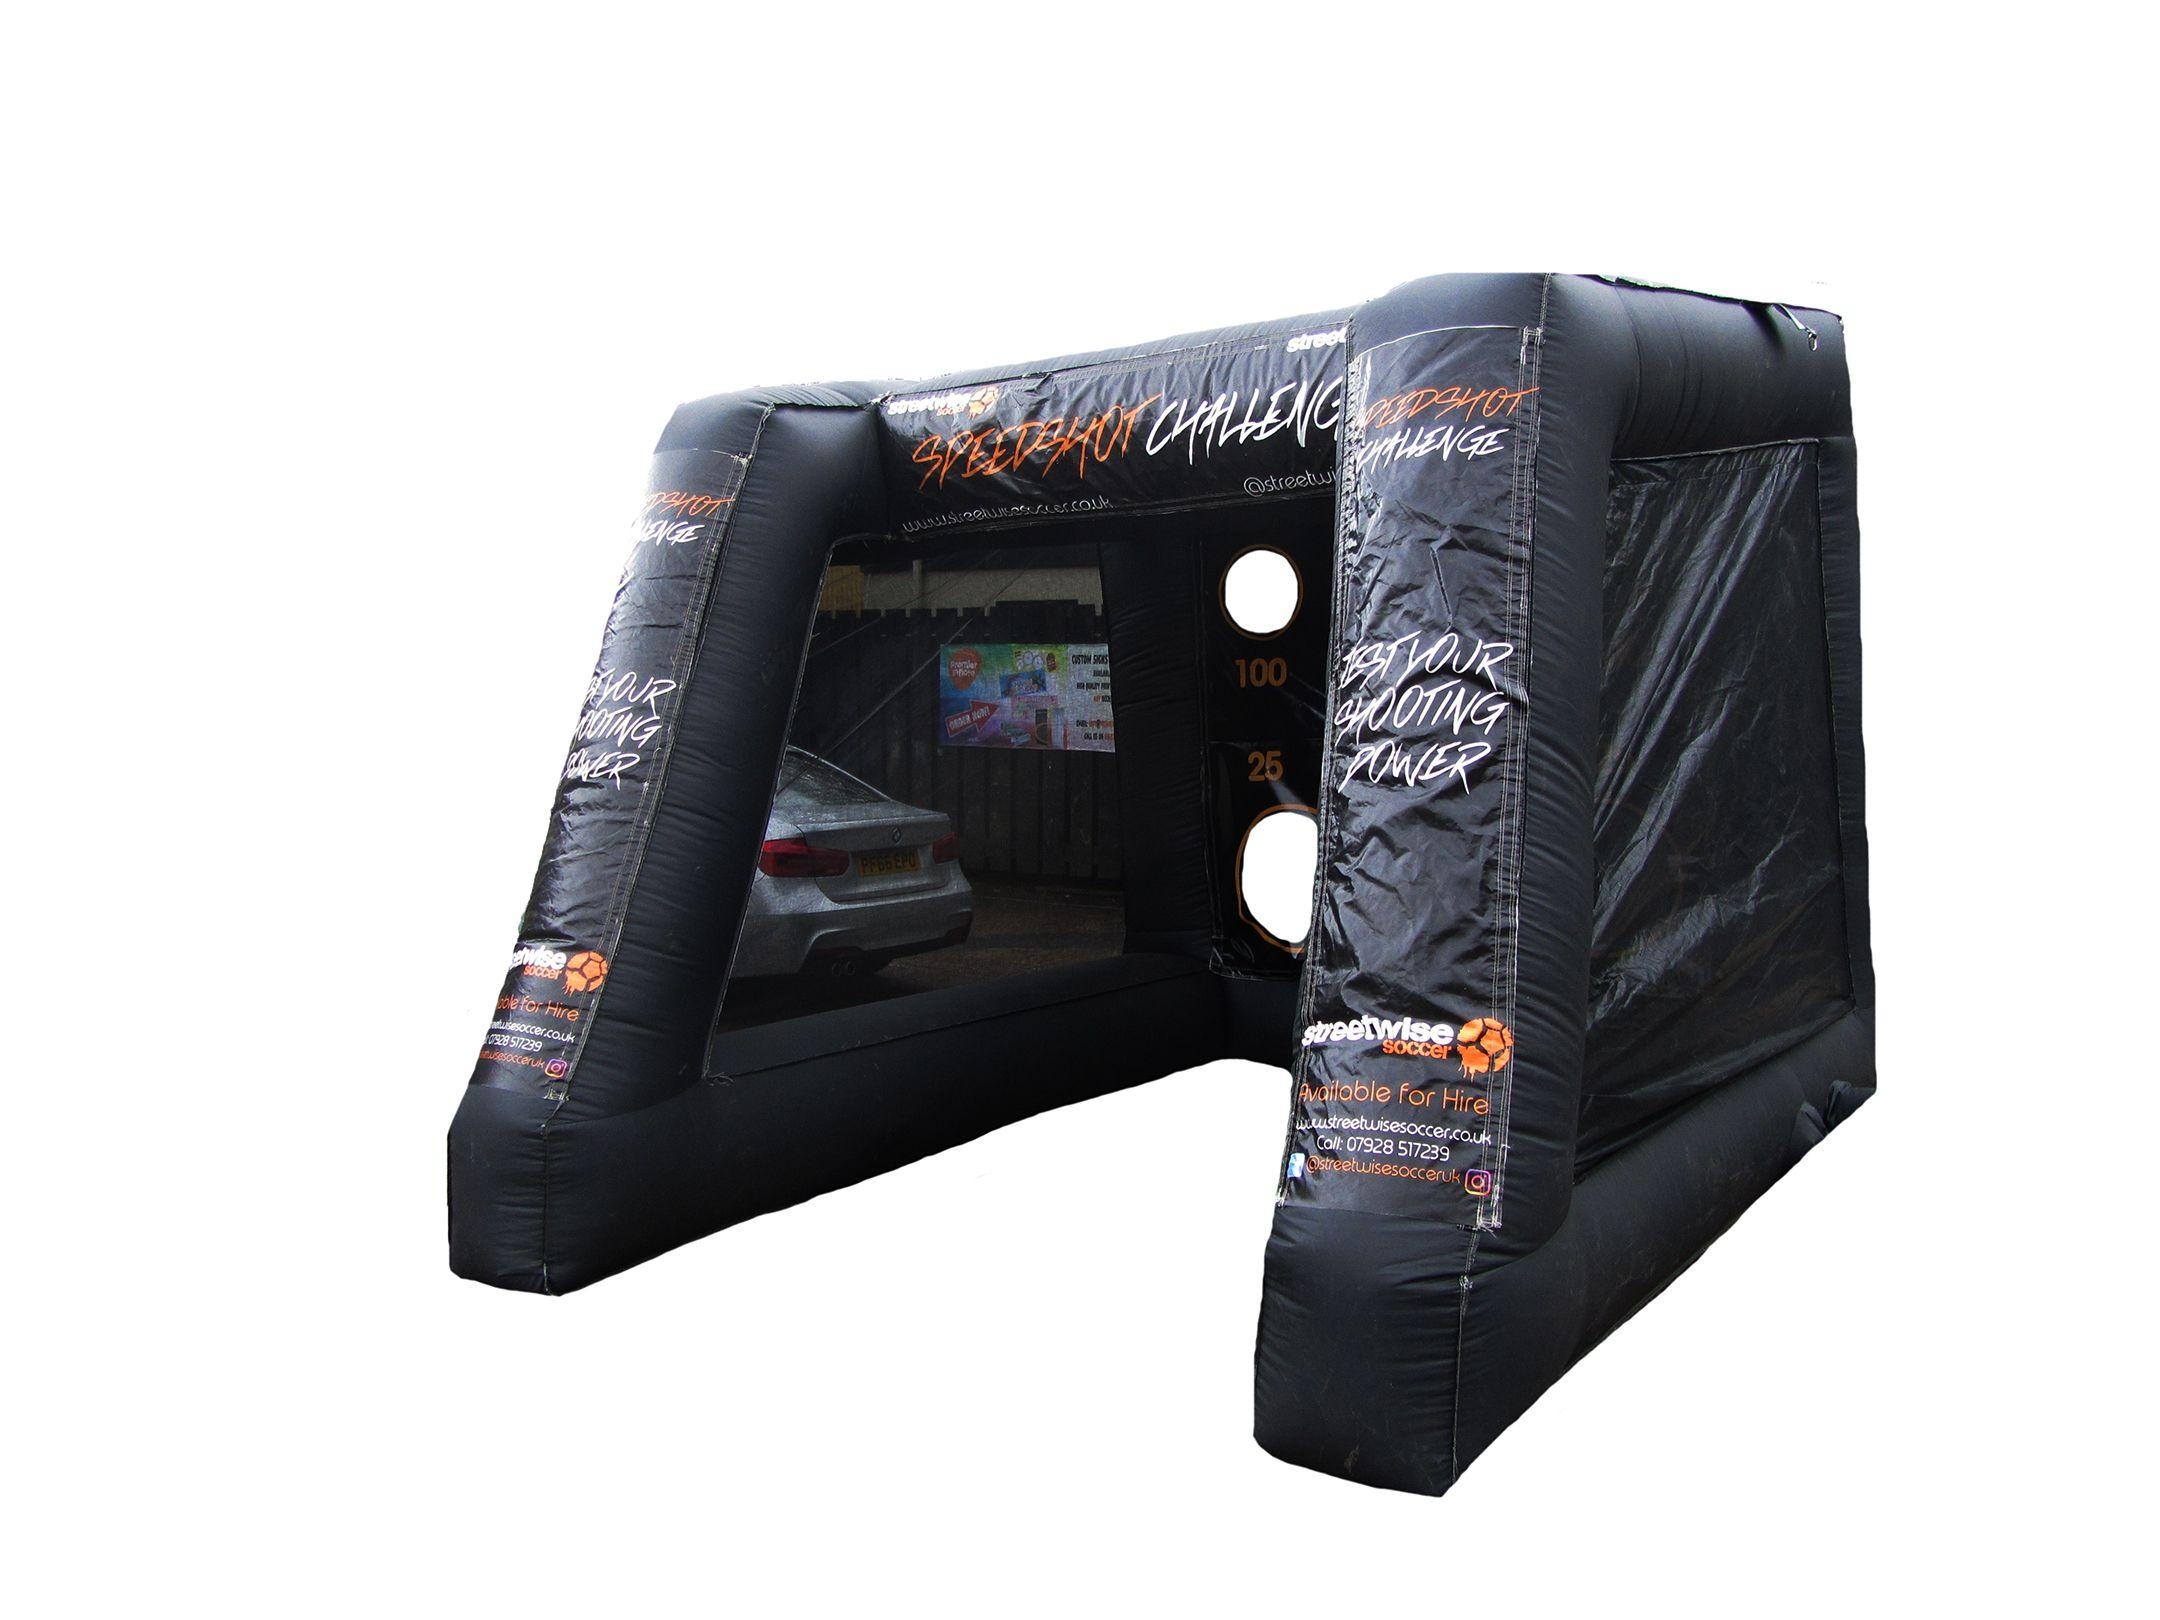 Black pen shootout inflatable printed game activity compressor